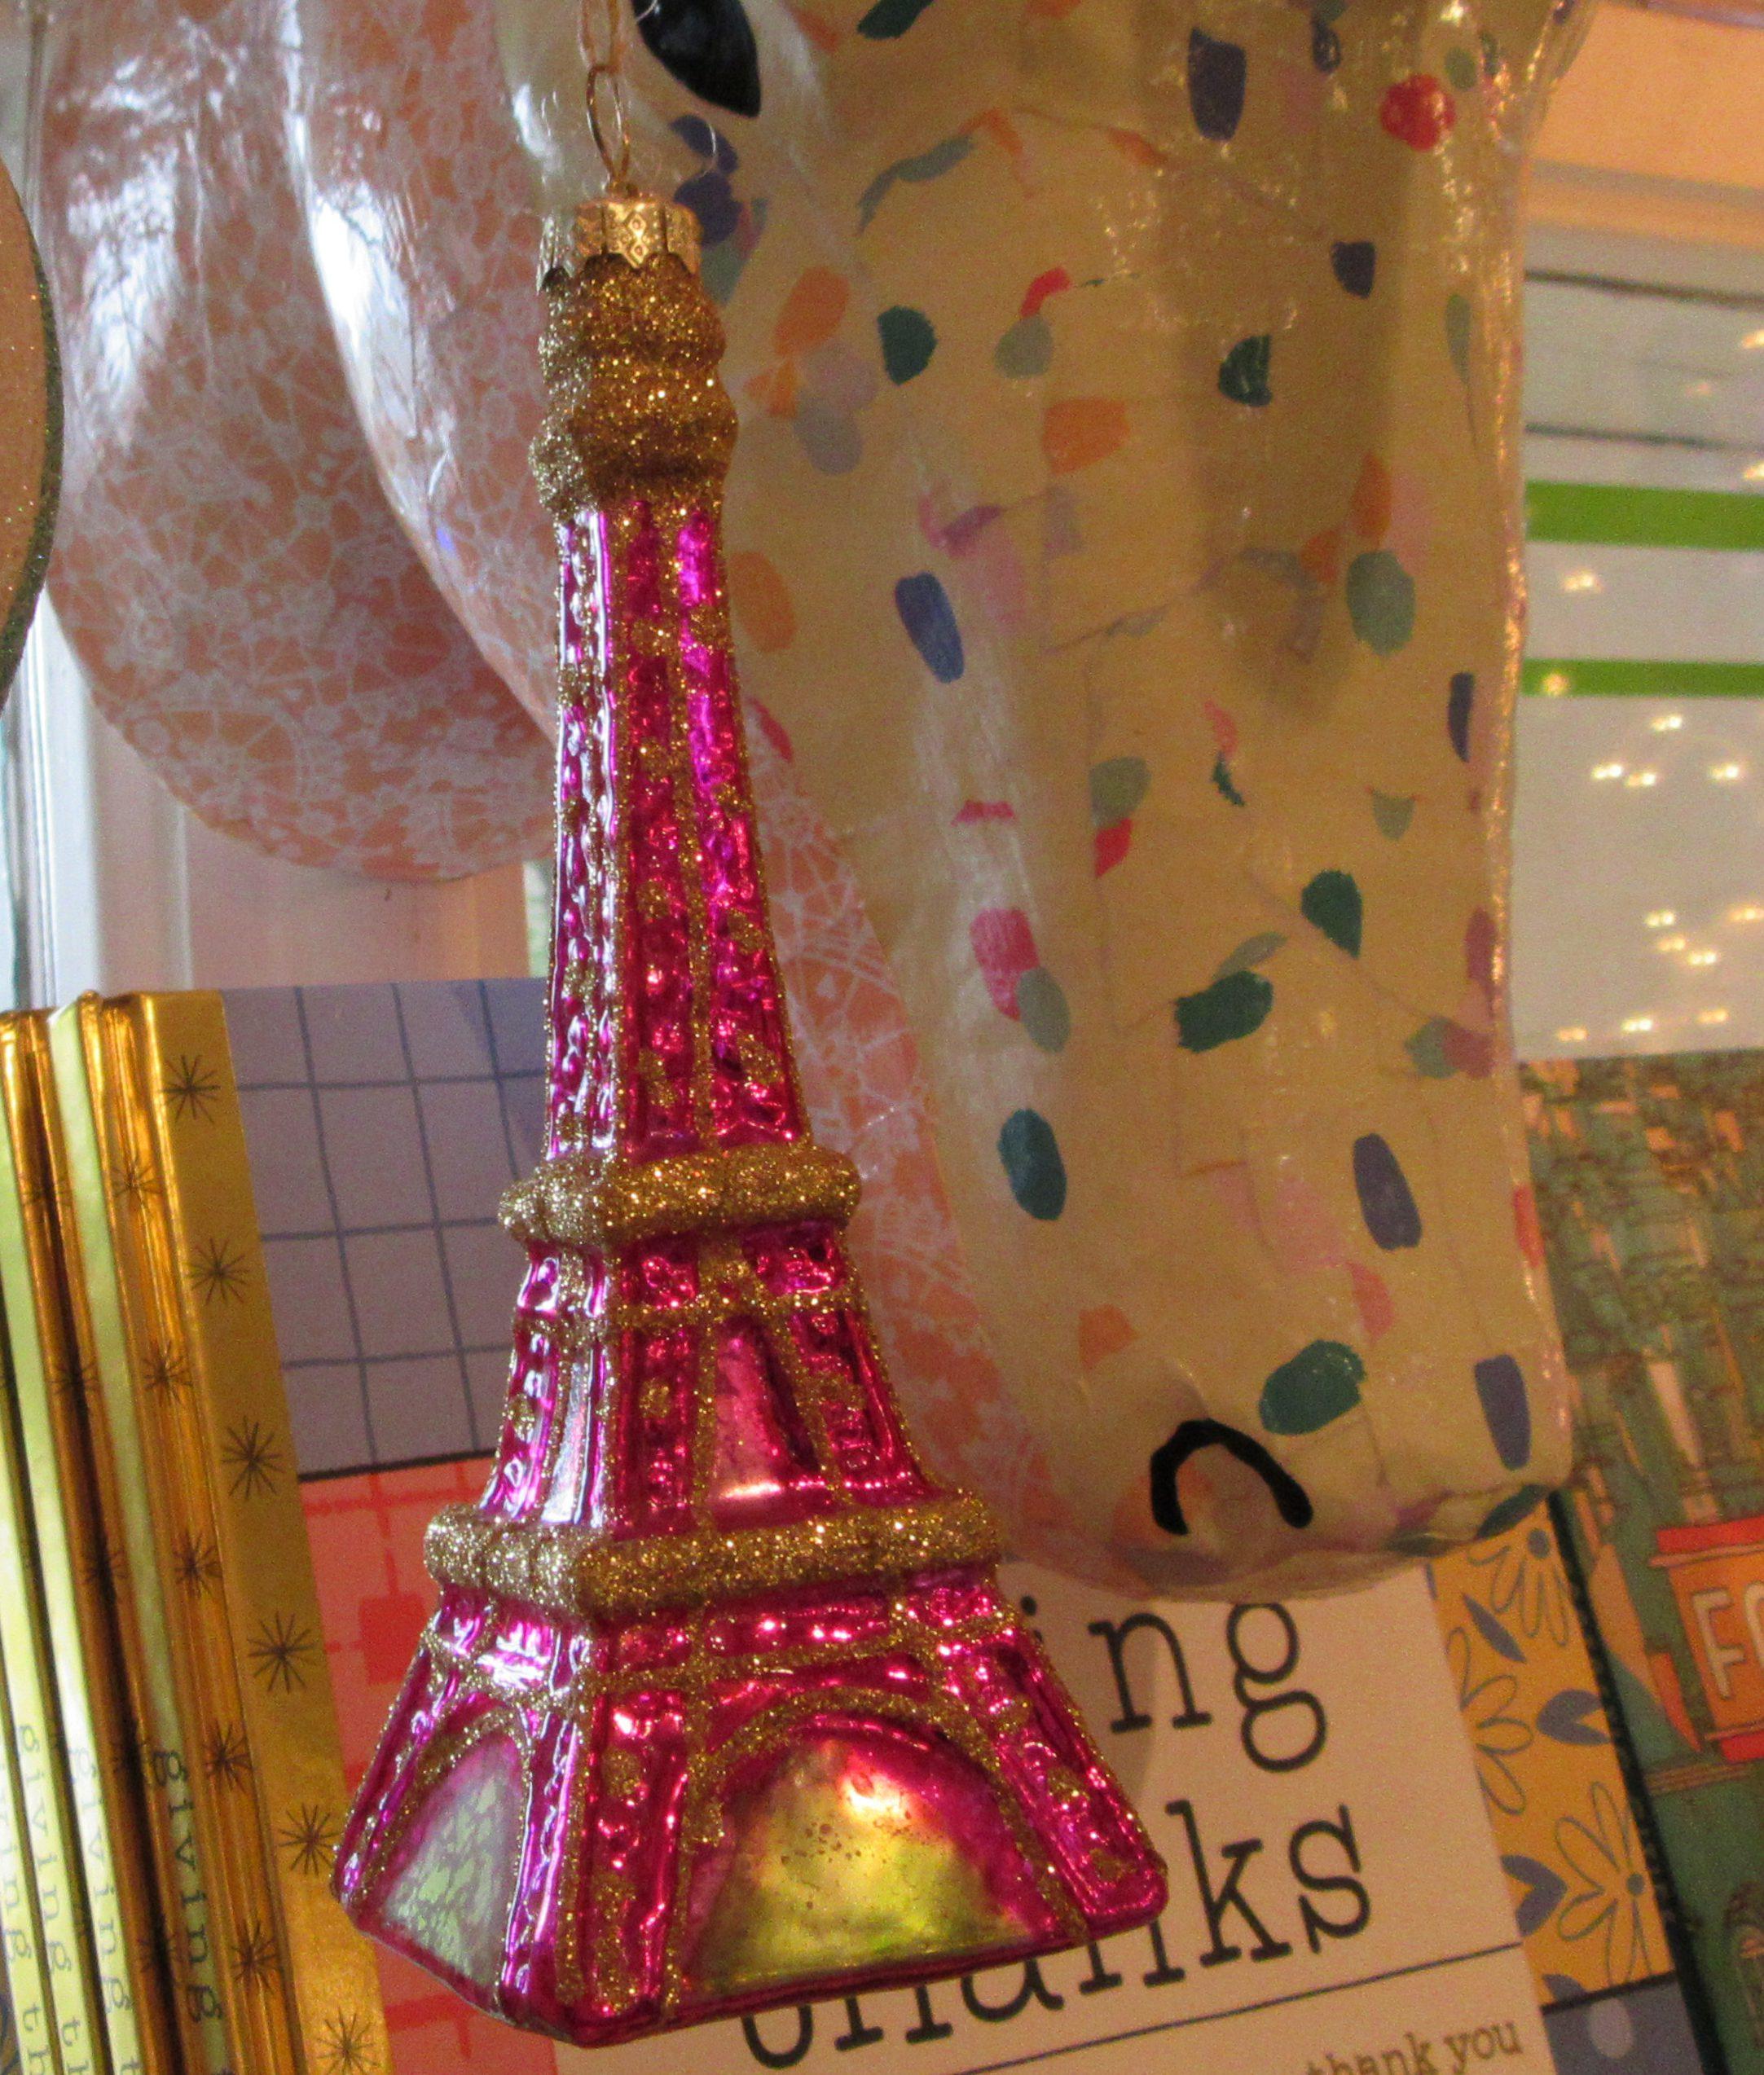 Eiffel tower christmas tree ornament - Pink Eiffel Tower Ornament